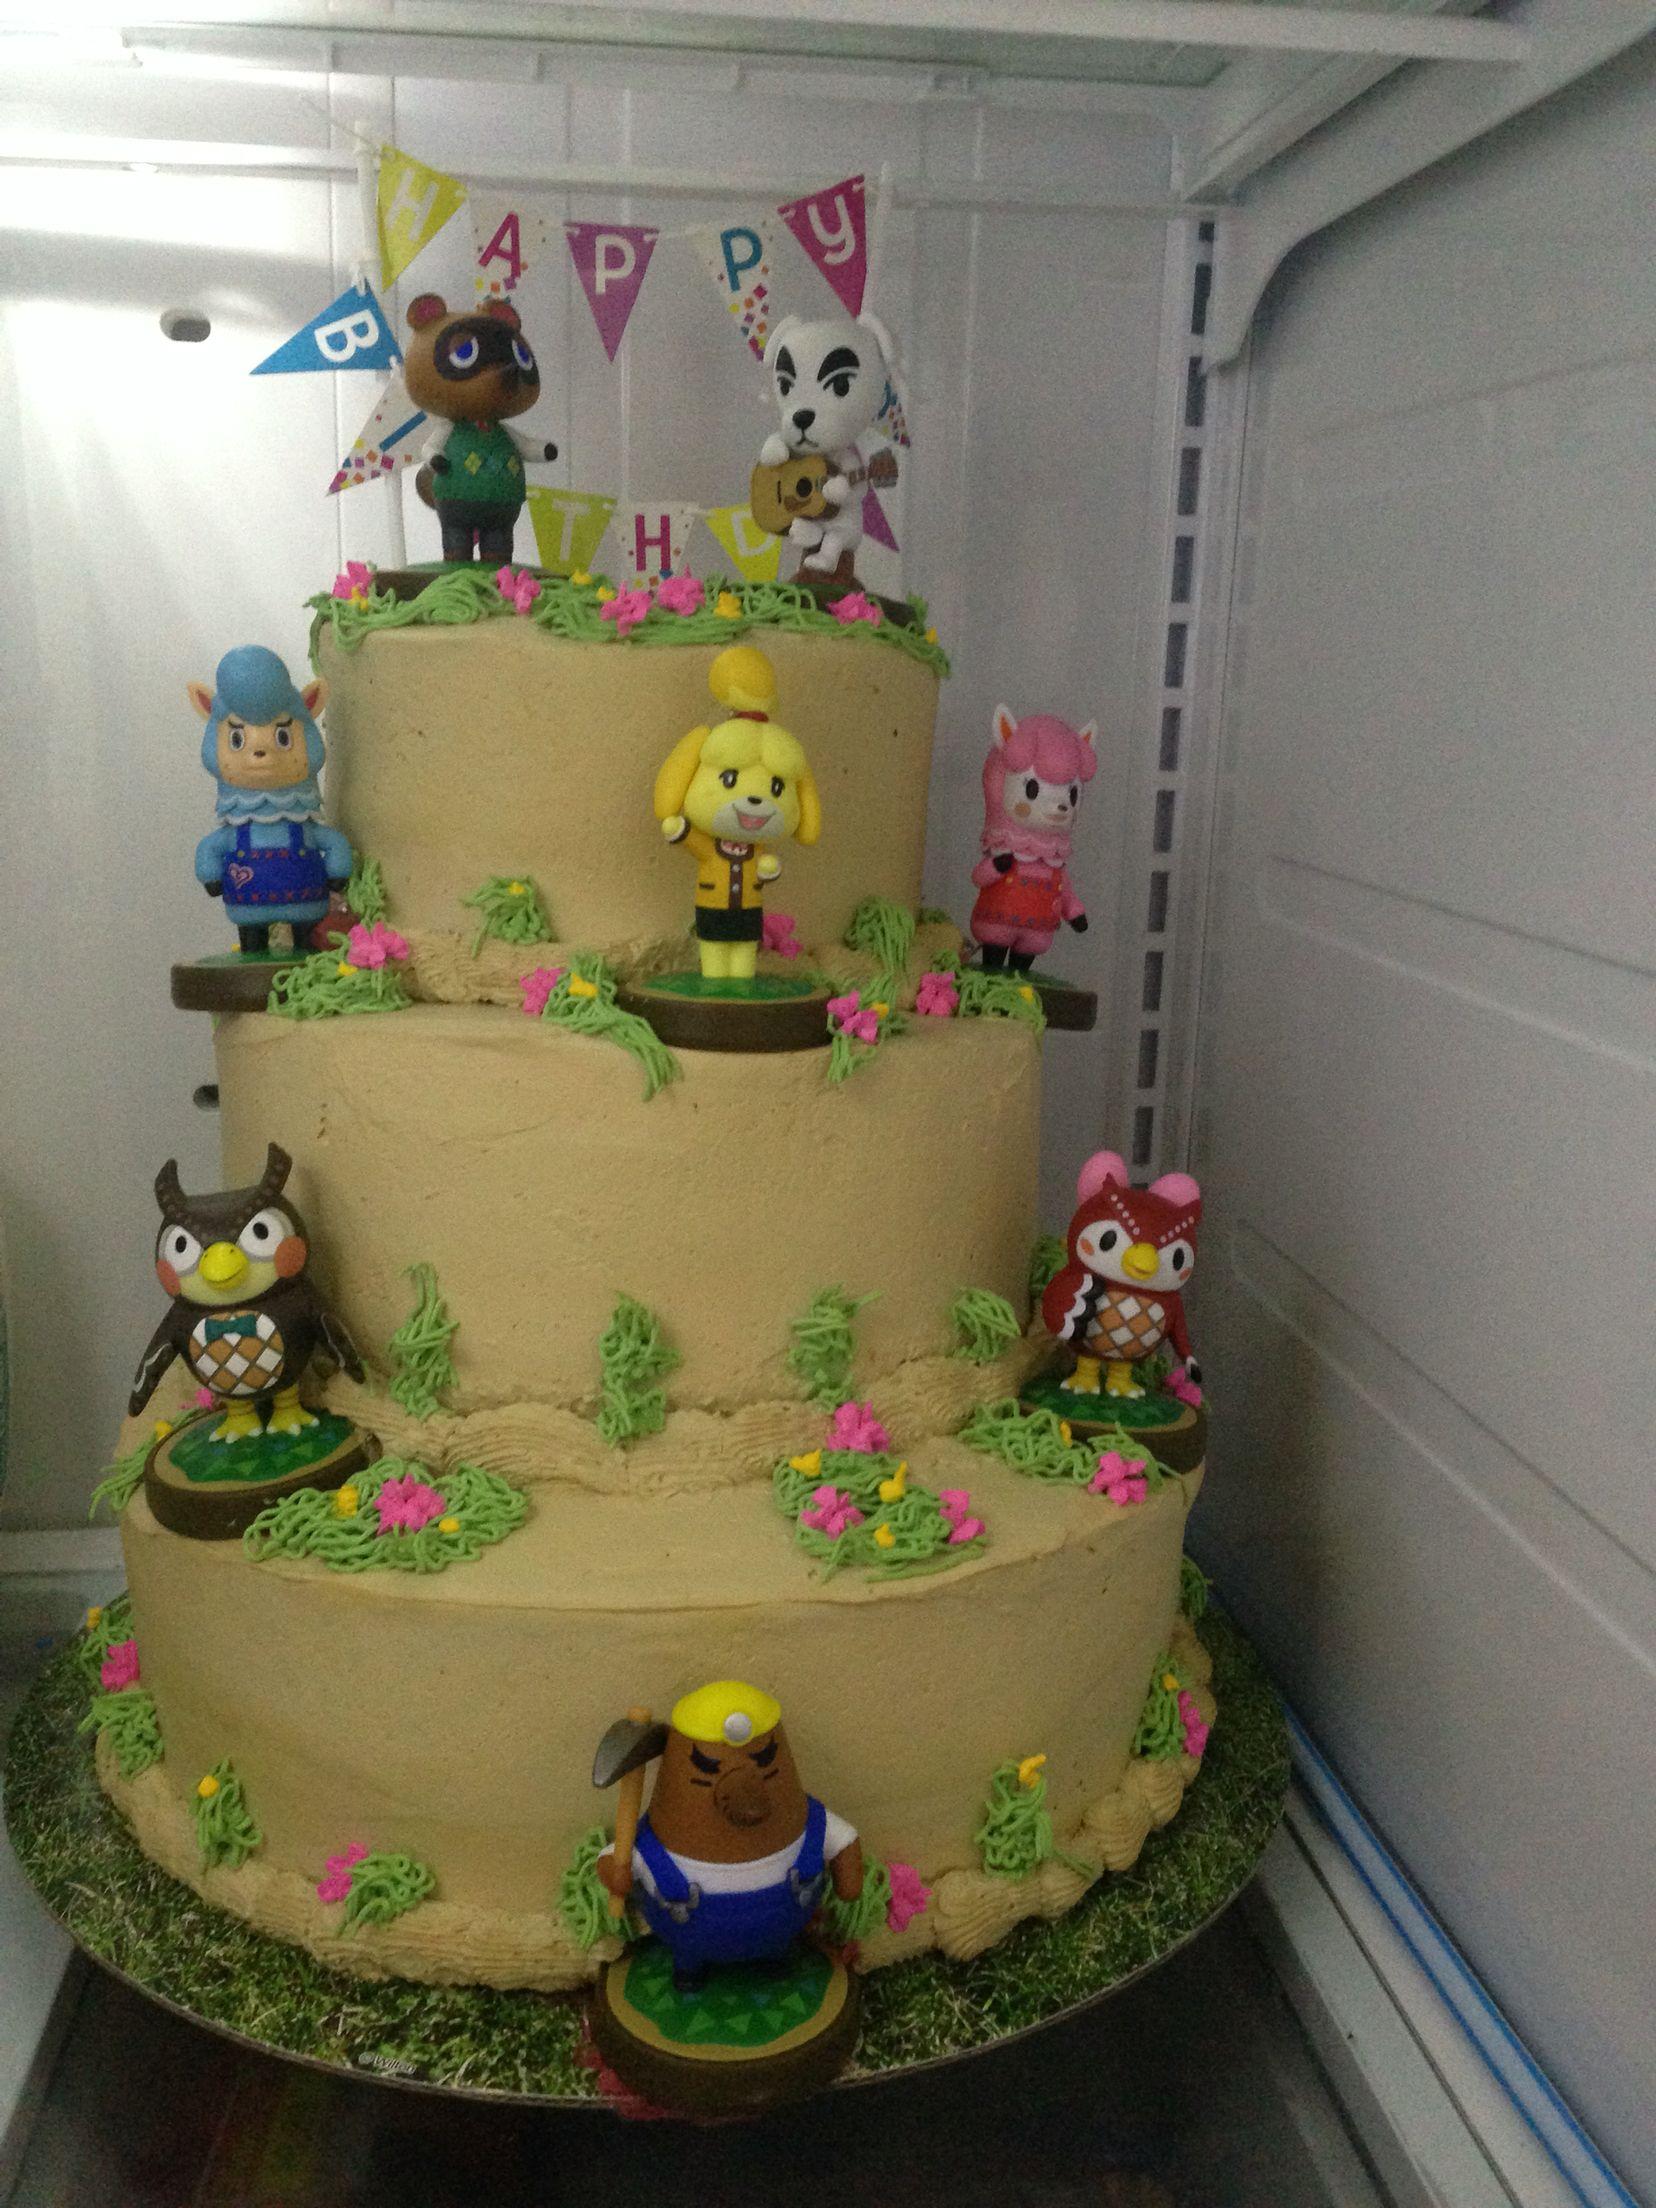 Wondrous Animal Crossing Birthday Cake Made From Amiibos With Images Personalised Birthday Cards Veneteletsinfo